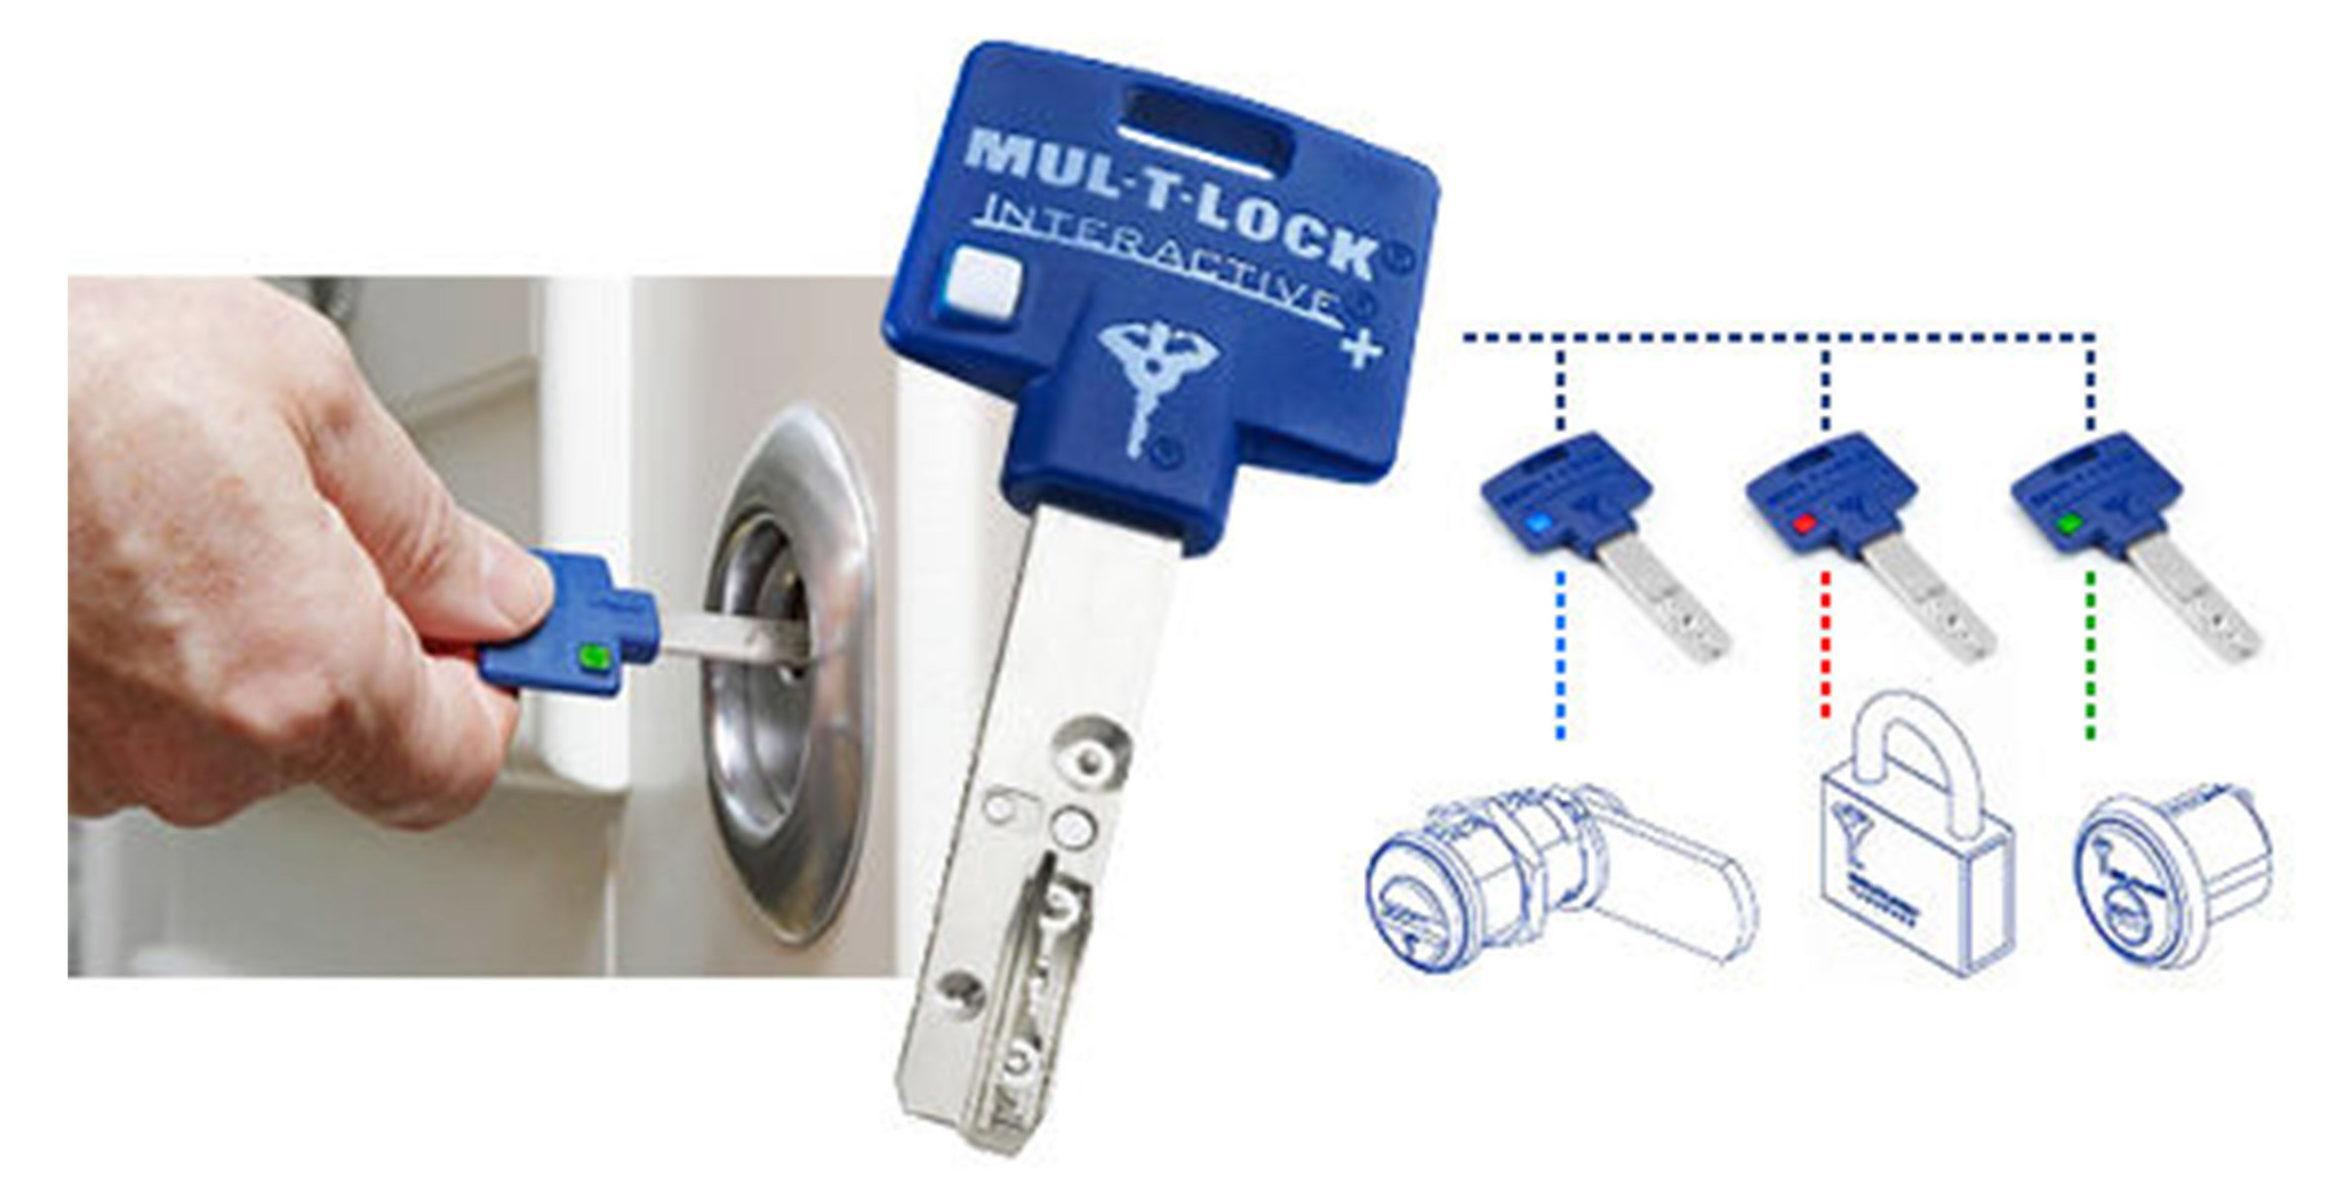 Сборка мастер системы Mul-t-lock в Самаре